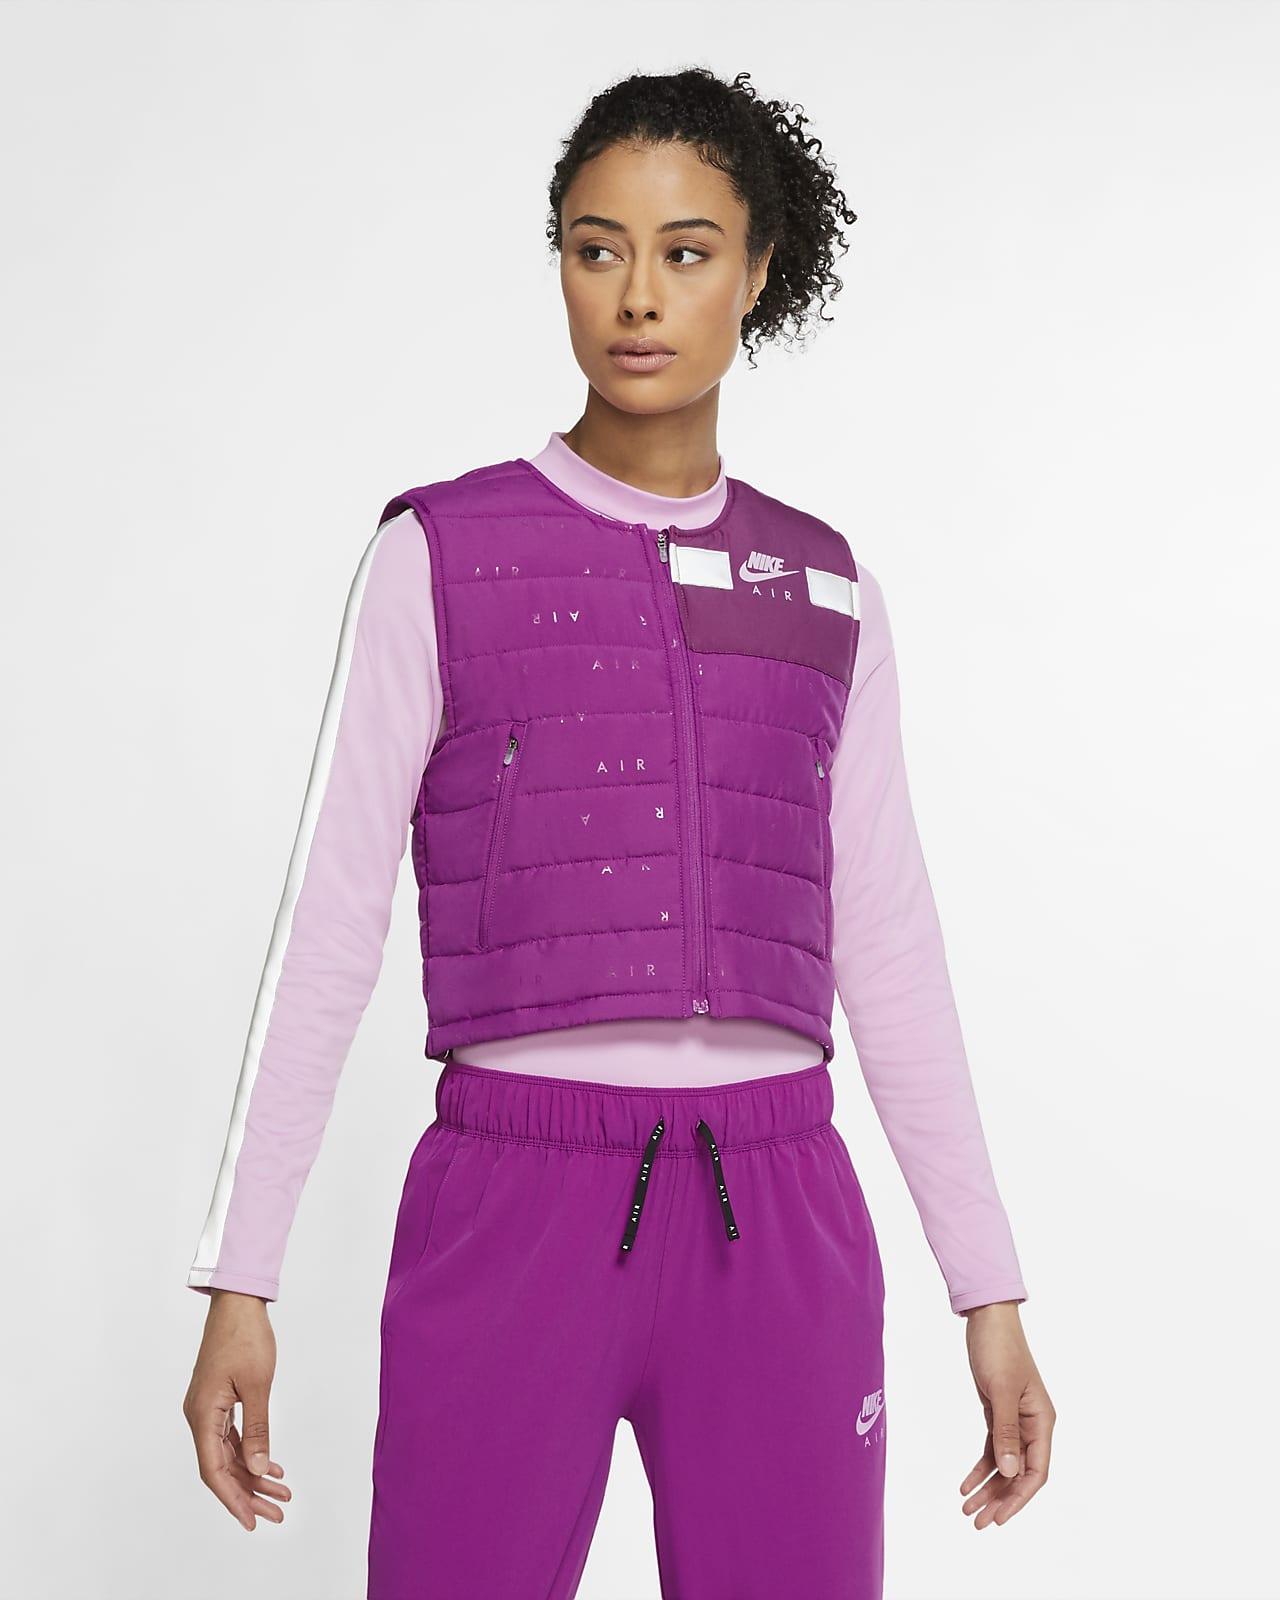 Nike Air Armilla de running - Dona